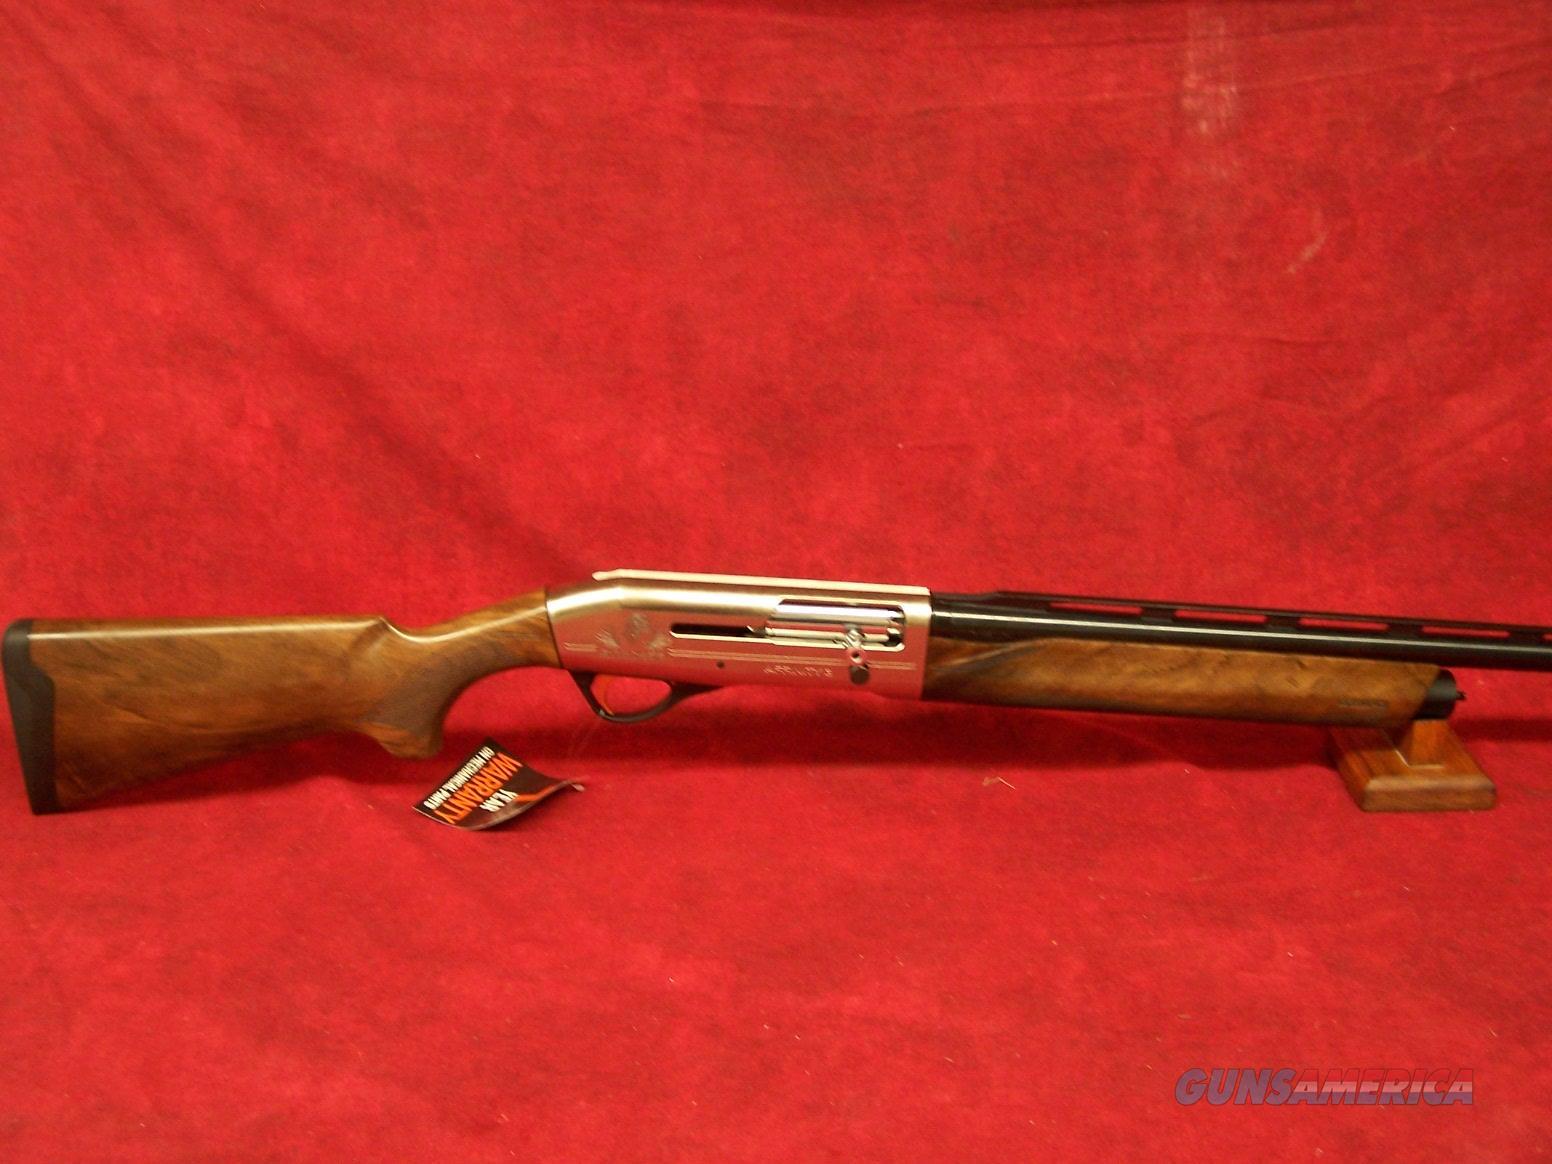 "Affinity 3 Companion 12ga 28"" Barrel (41260)  Guns > Shotguns > Franchi Shotguns > Auto Pump > Hunting"